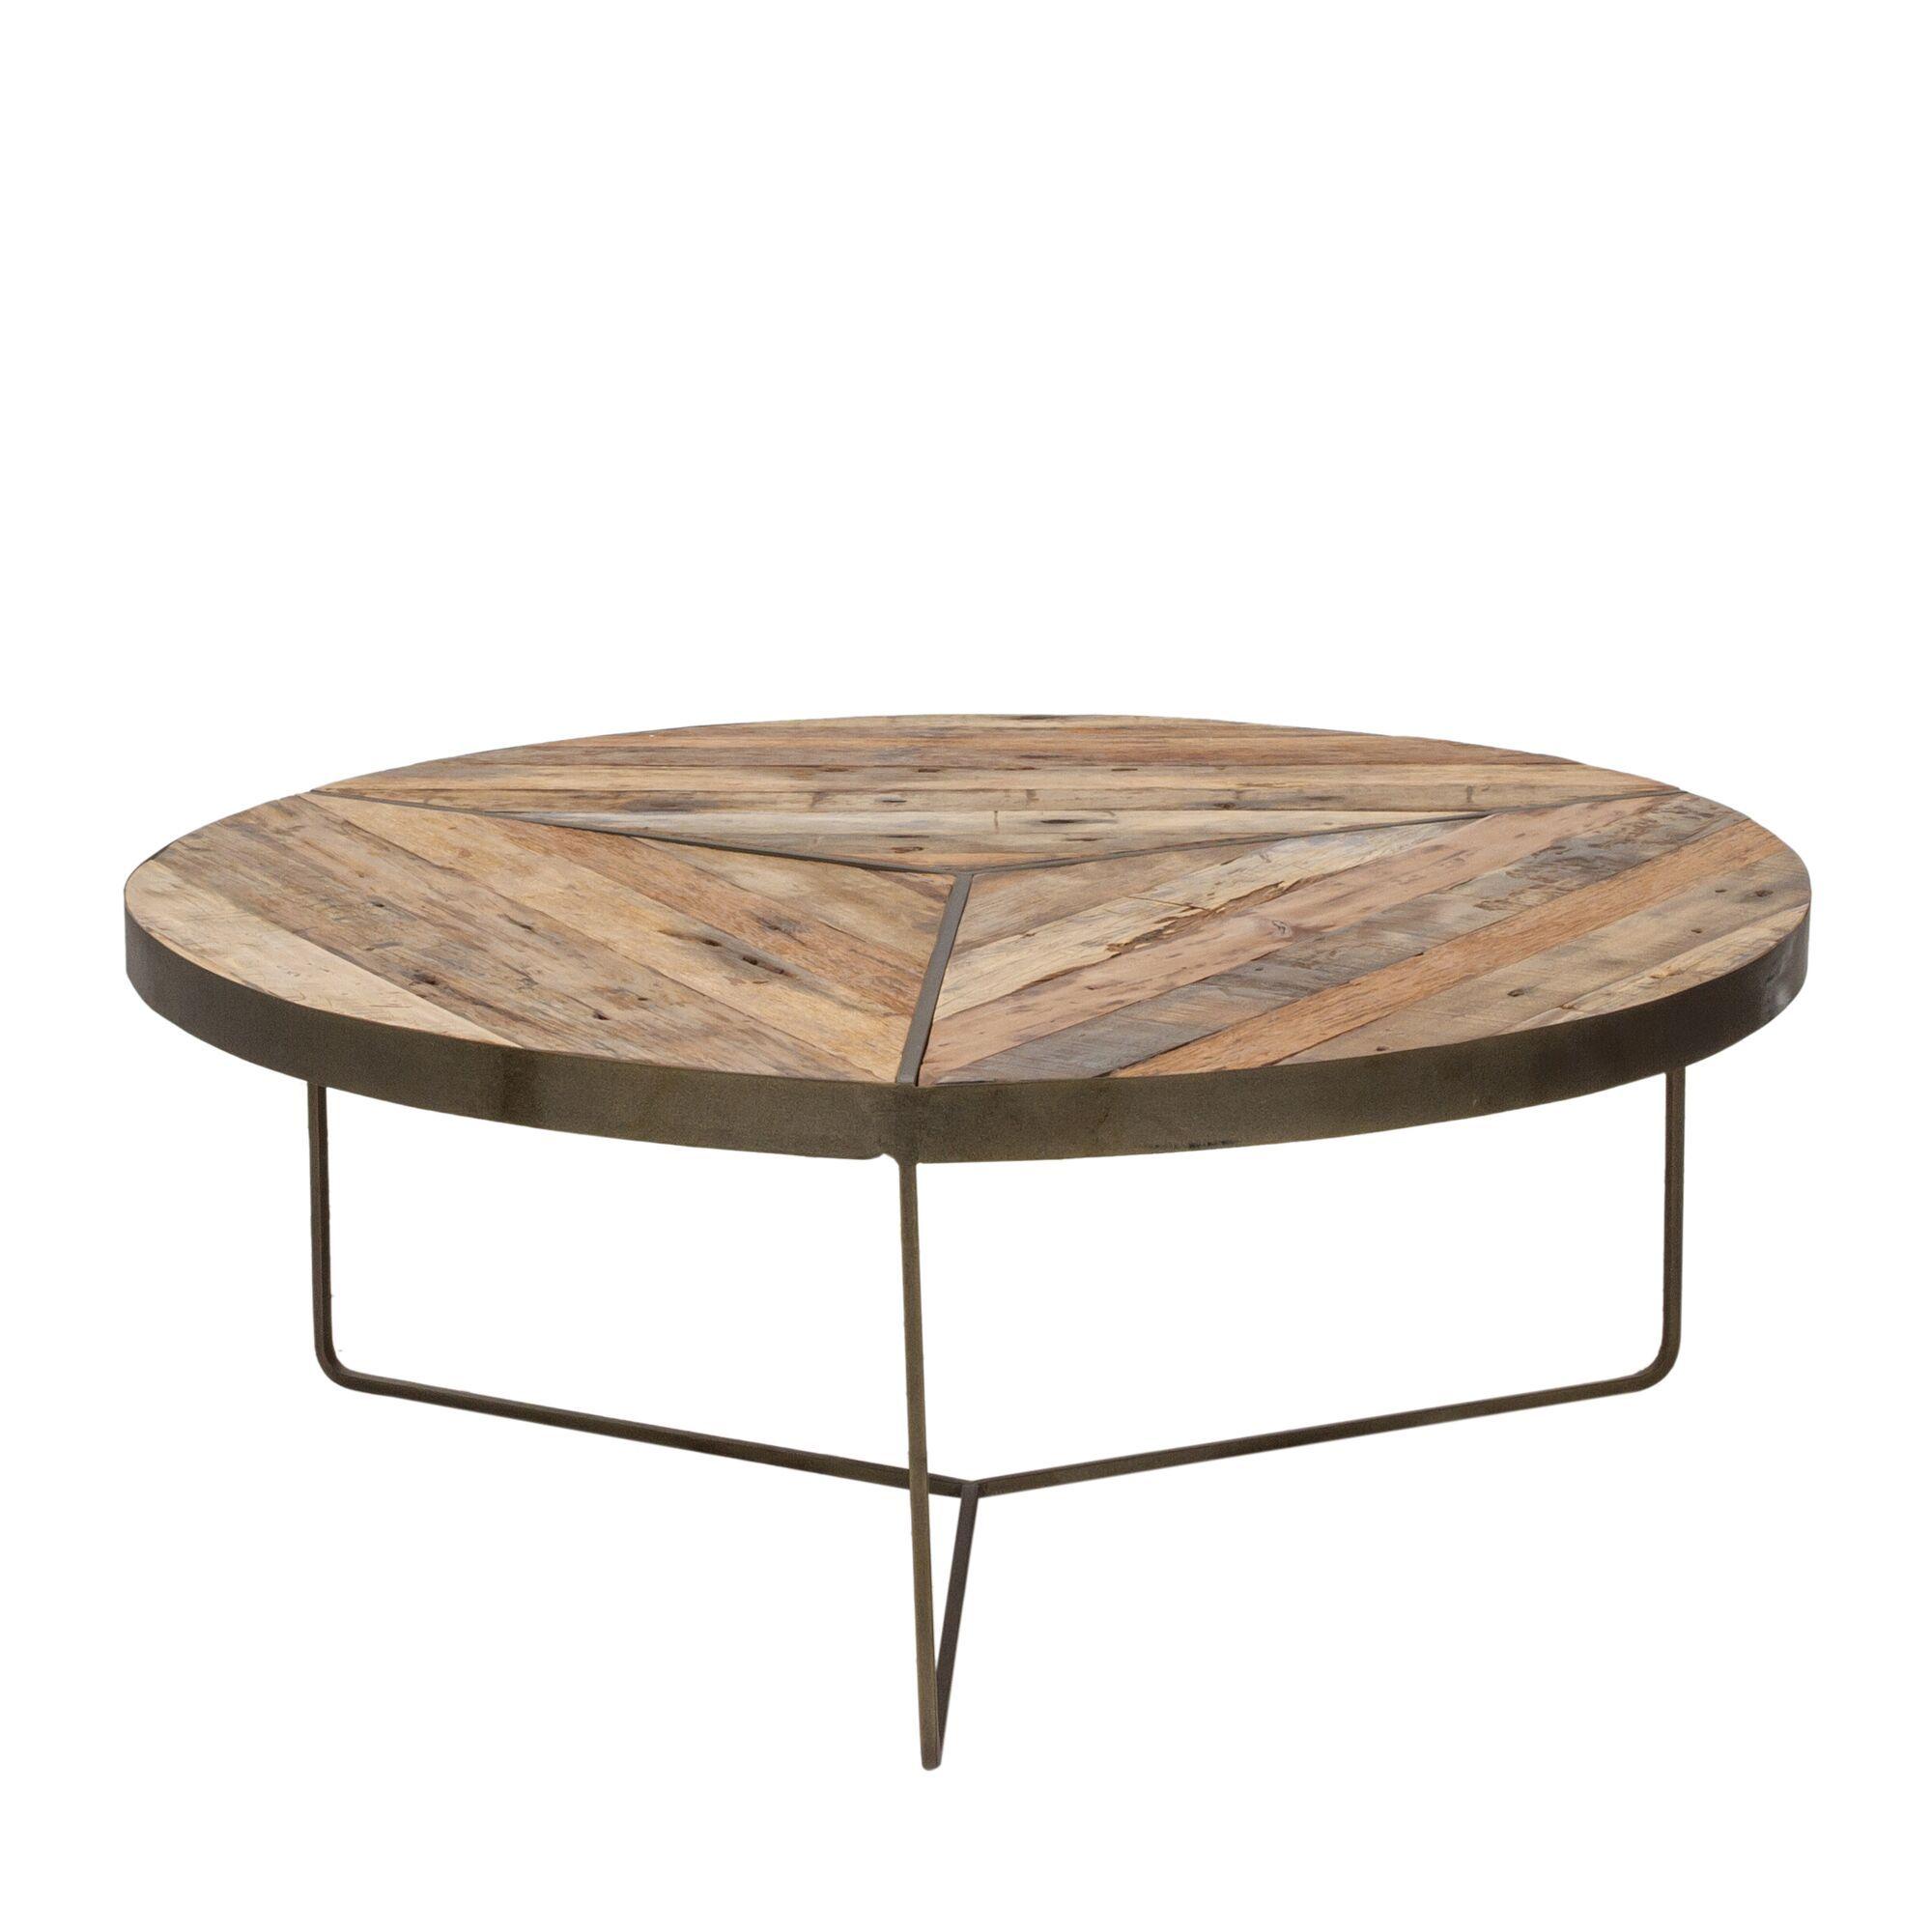 Kleo Boatwood Rustic Coffee Table Furniture Annie Maison Rustic Coffee Tables Wood Coffee Table Rustic Coffee Table [ 2000 x 2000 Pixel ]